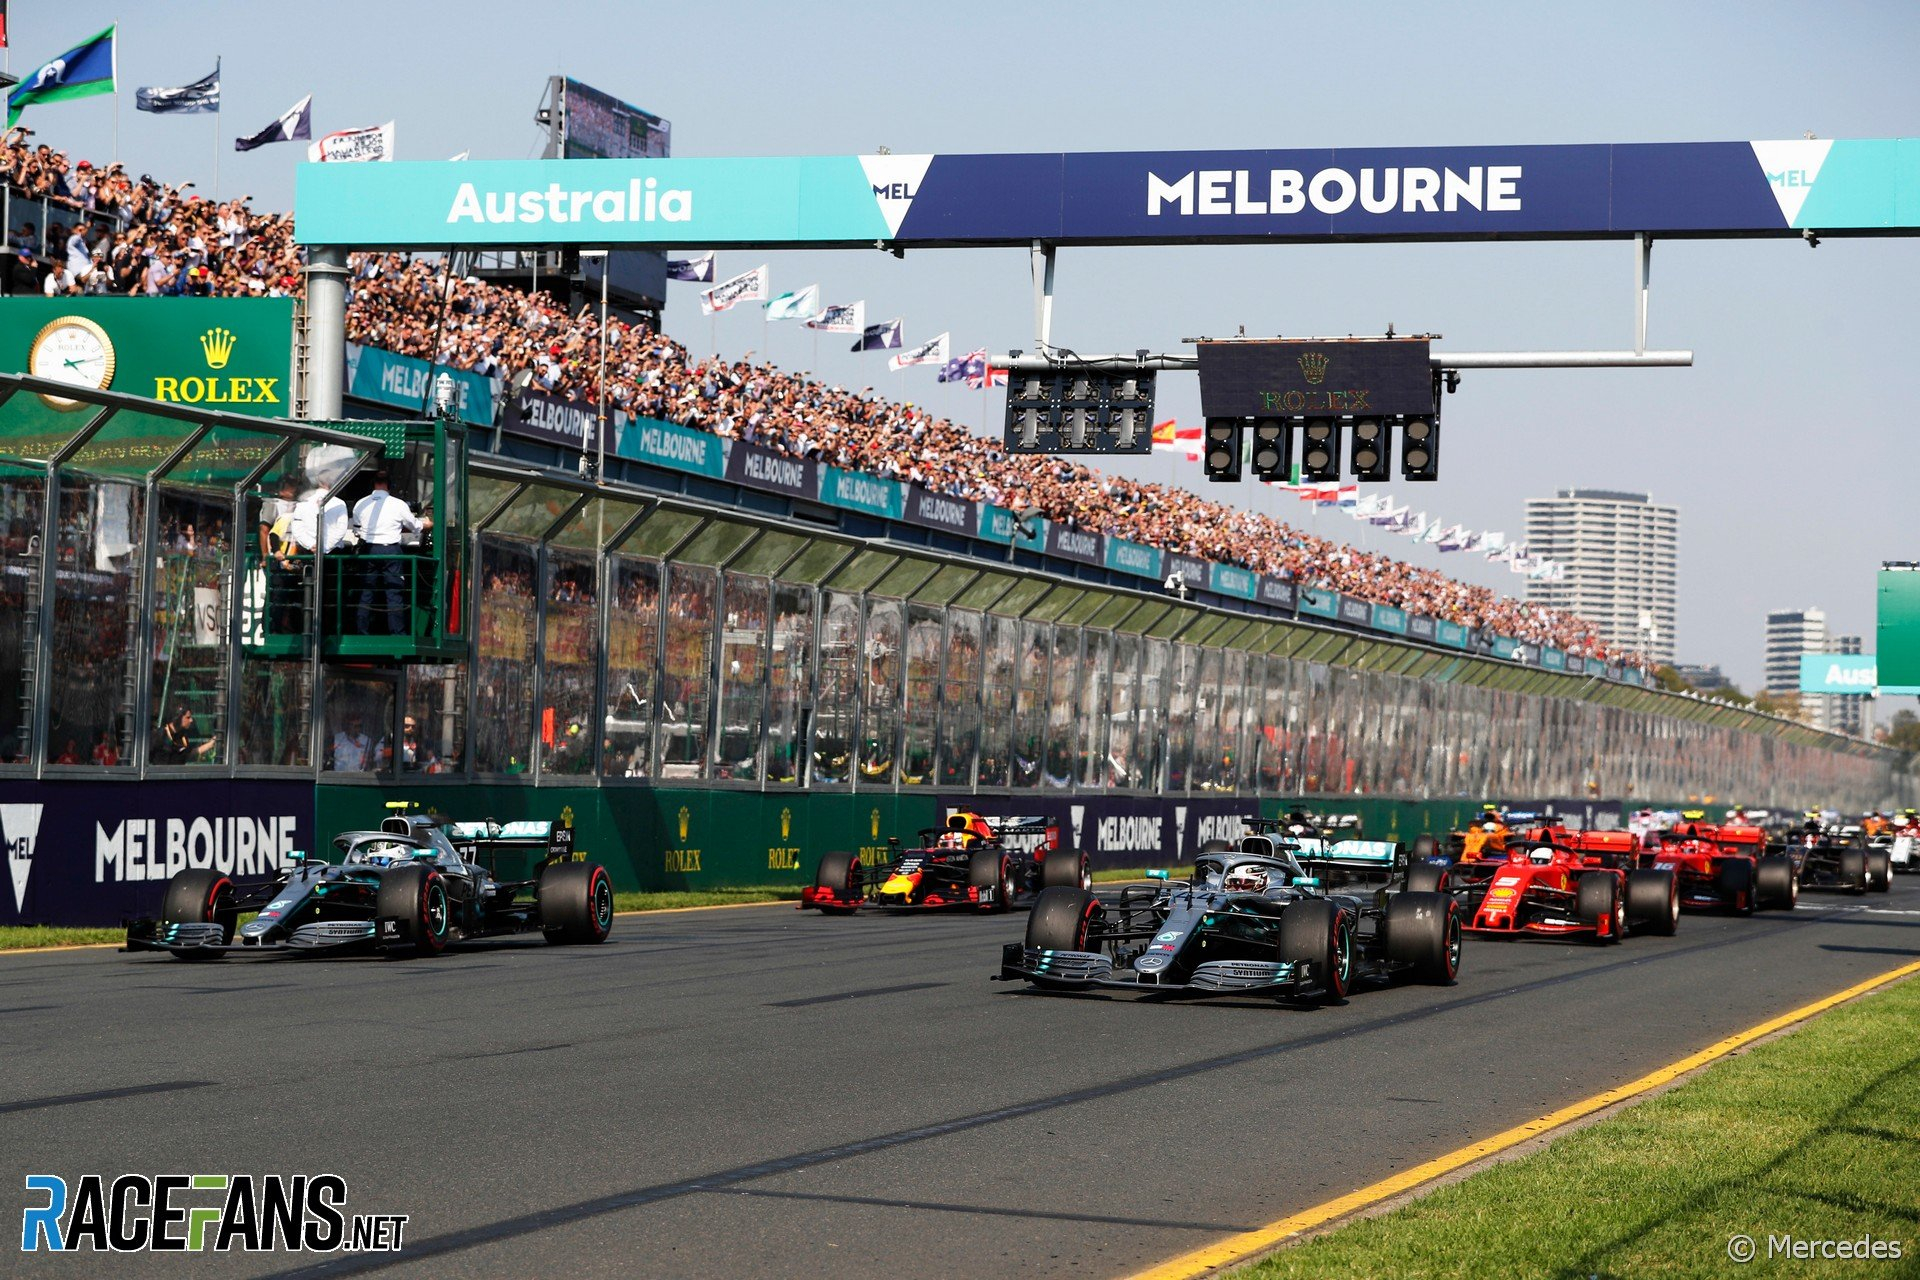 2019 F1 Calendar: Formula One Race Schedule - Racefans Formula 1 Calendar 2019 Ical